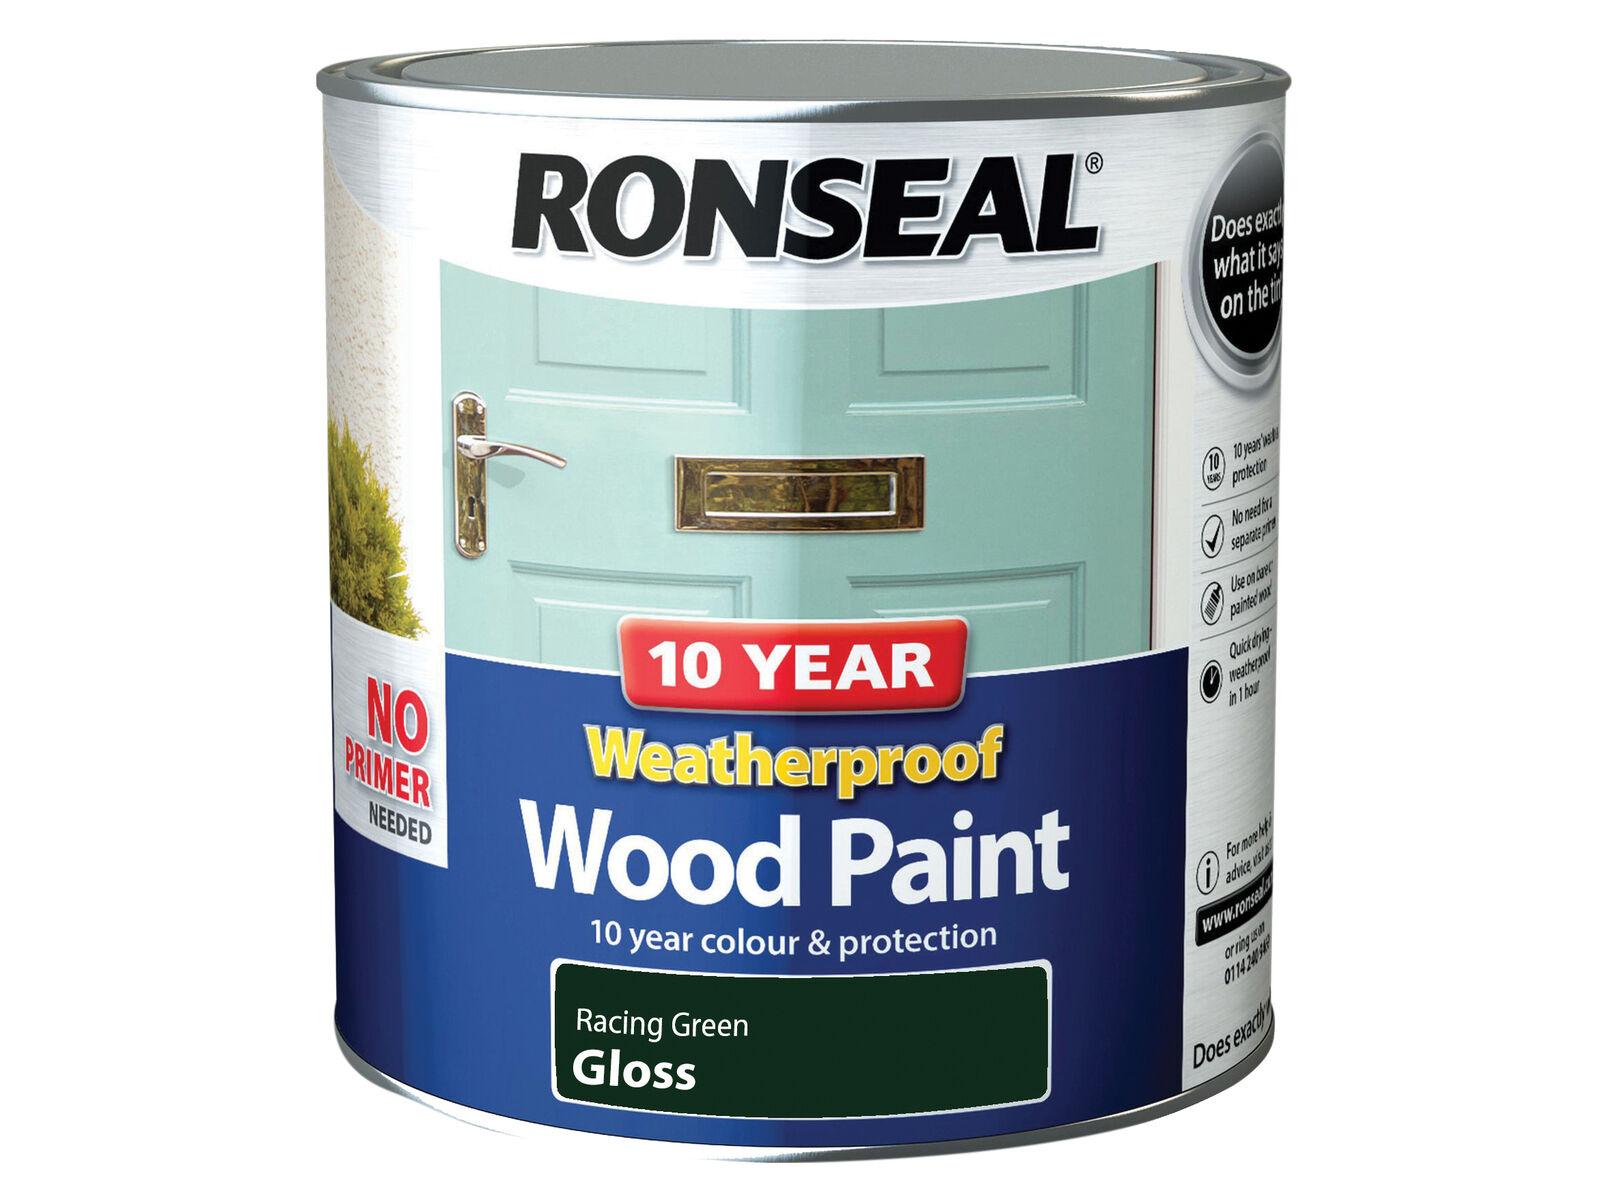 Ronseal 10 Year Weatherproof Wood Paint Racing Green Gloss 2.5 Litre